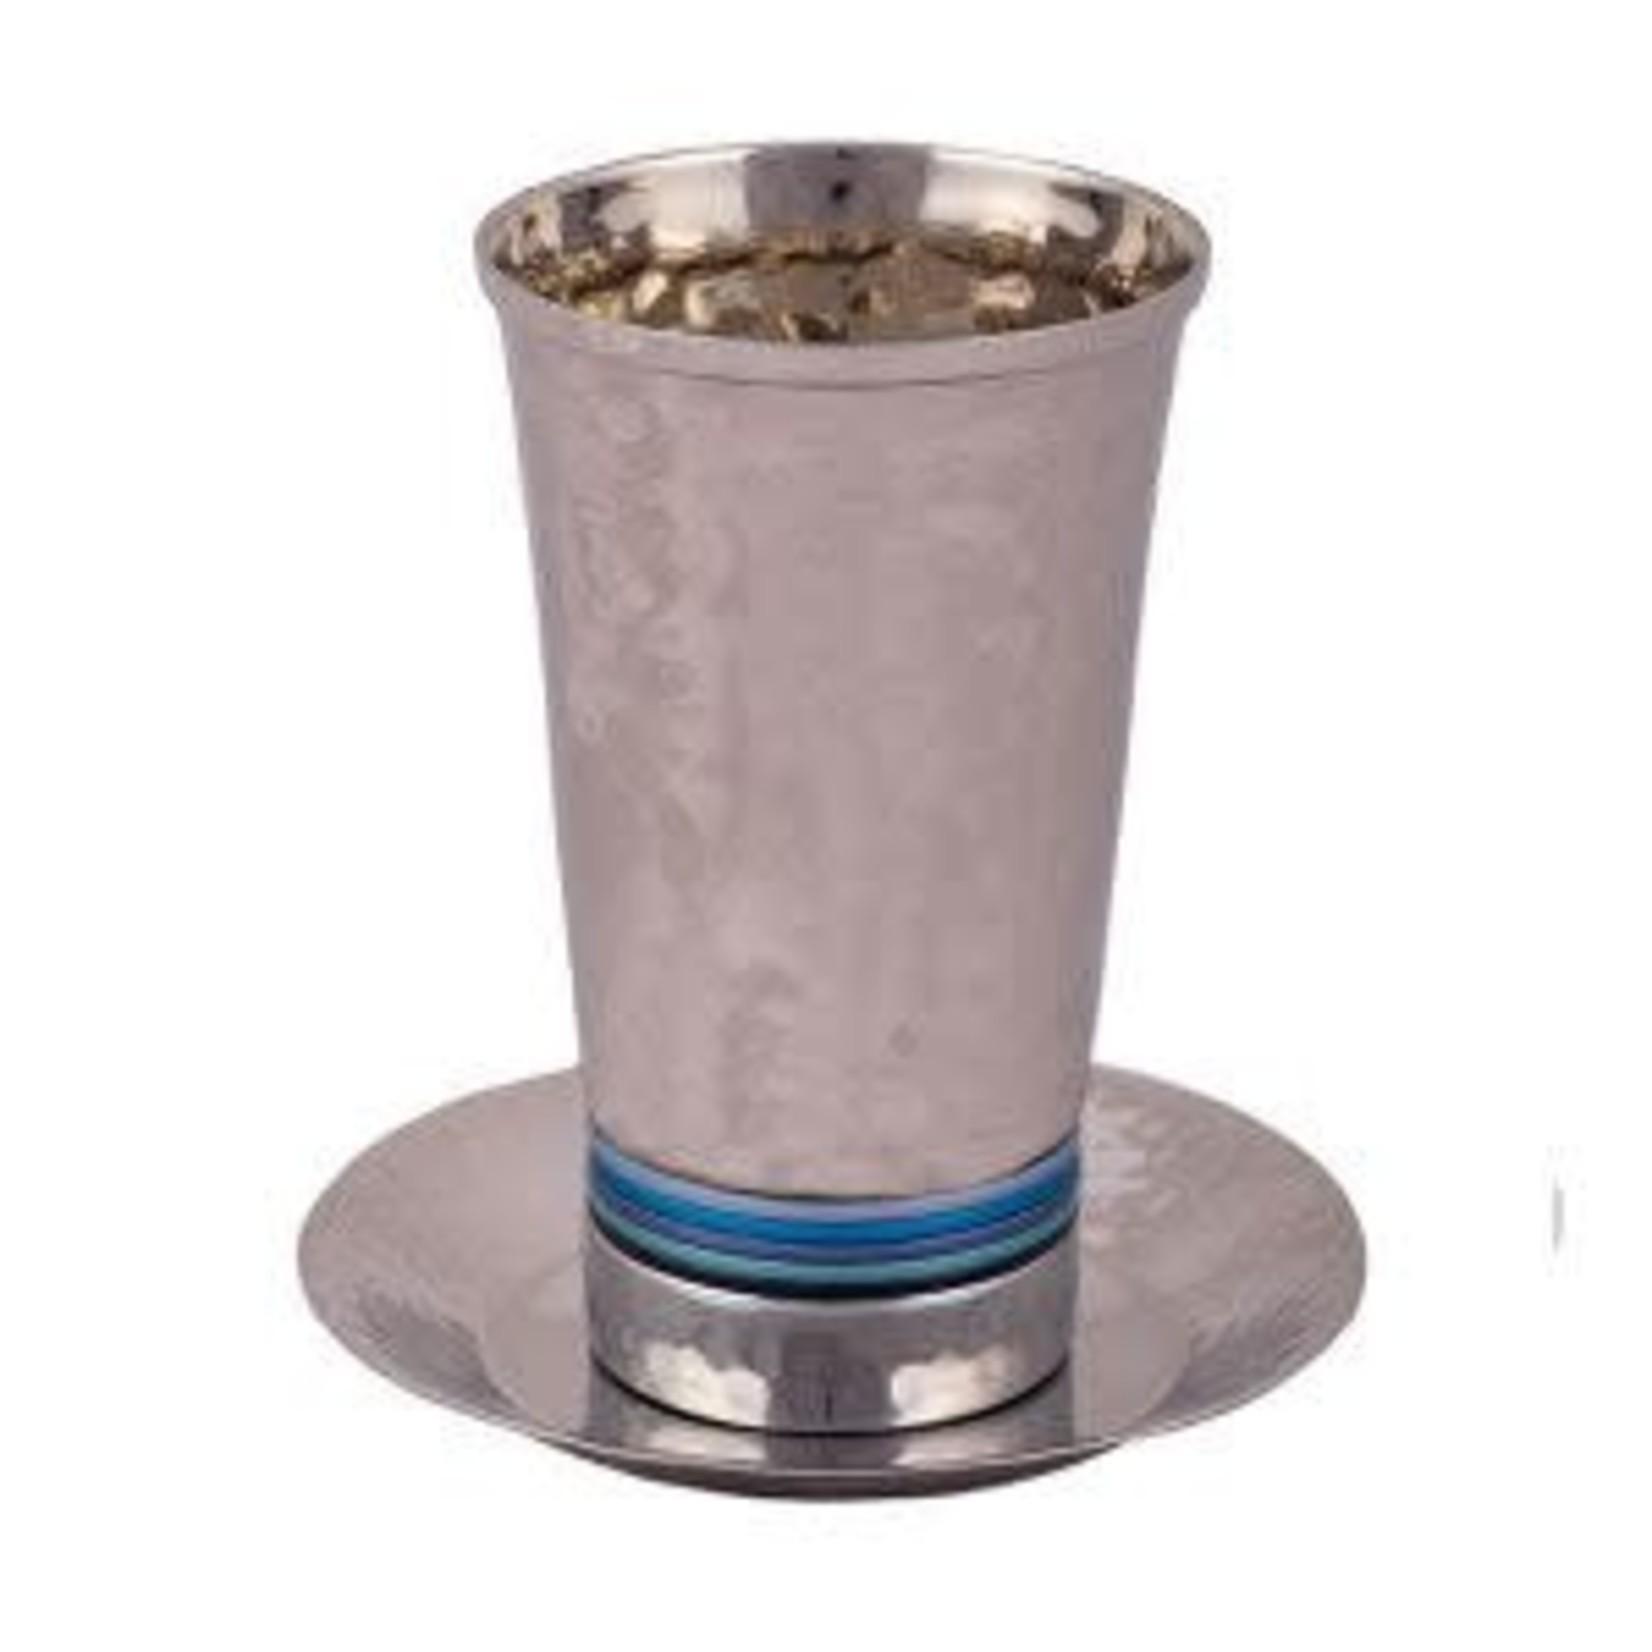 Yair Emanuel Kiddush Cup Set, Stemless, Aluminum